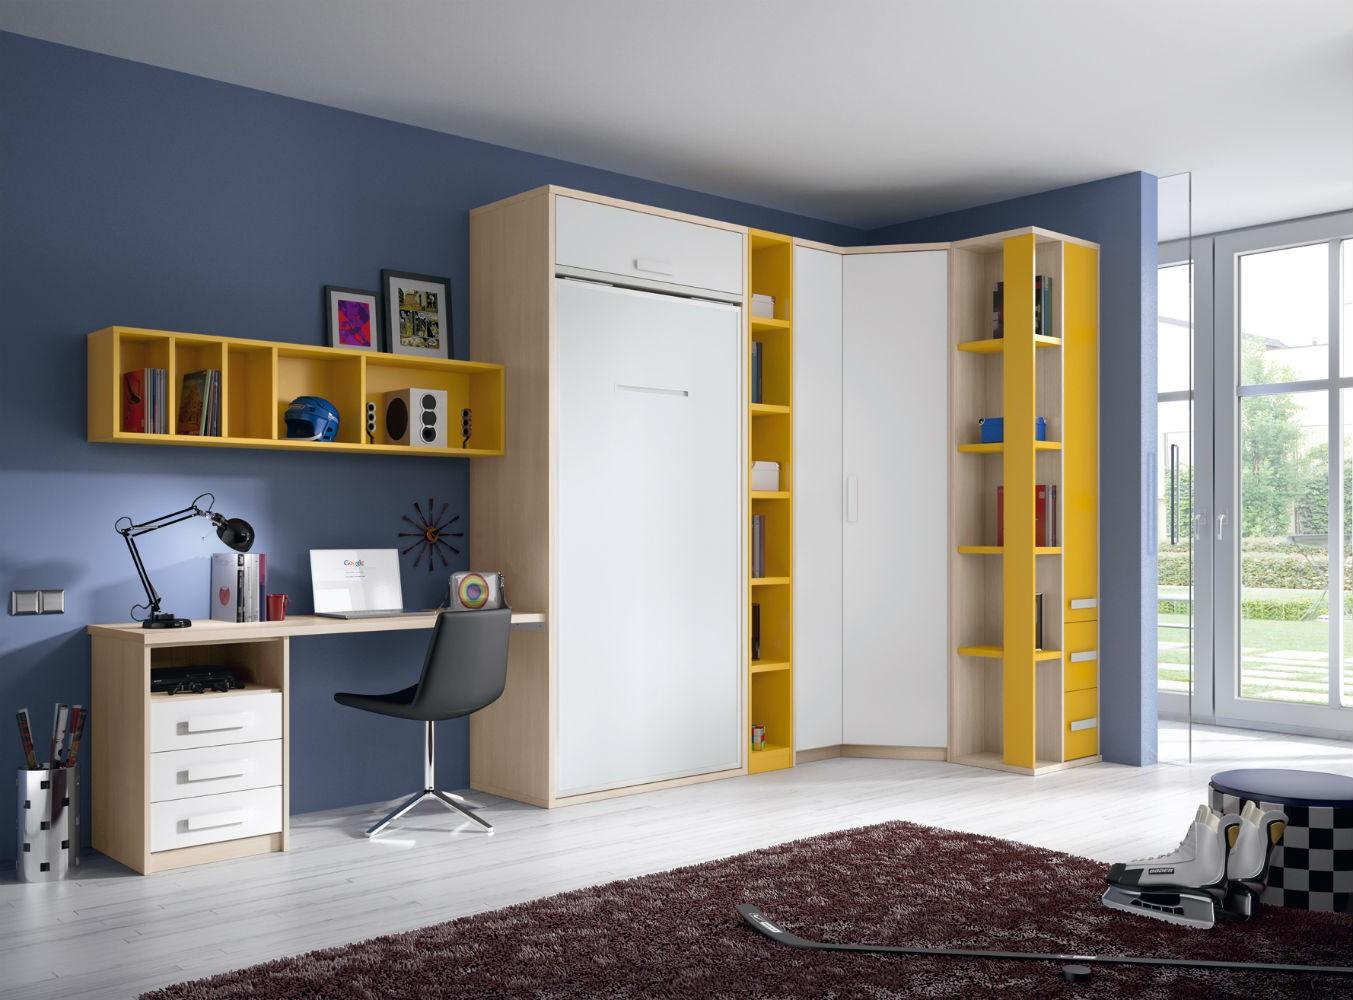 Dormitorio infantil juvenil moderno literas abatibles 69 f224 for Dormitorios juveniles abatibles